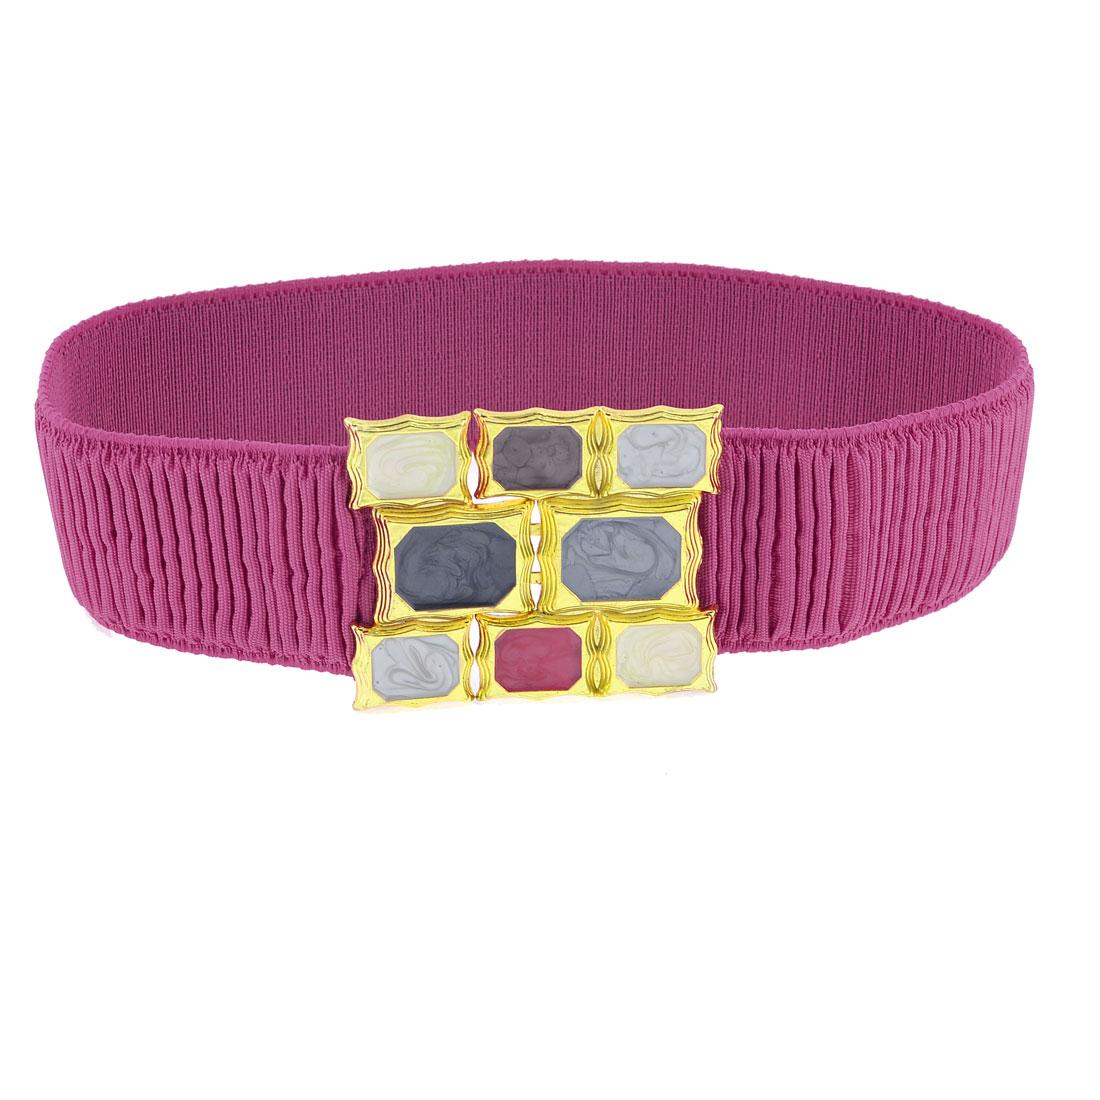 Fuchsia Pleated Elastic Band Gold Tone Metal Waist Belt for Women